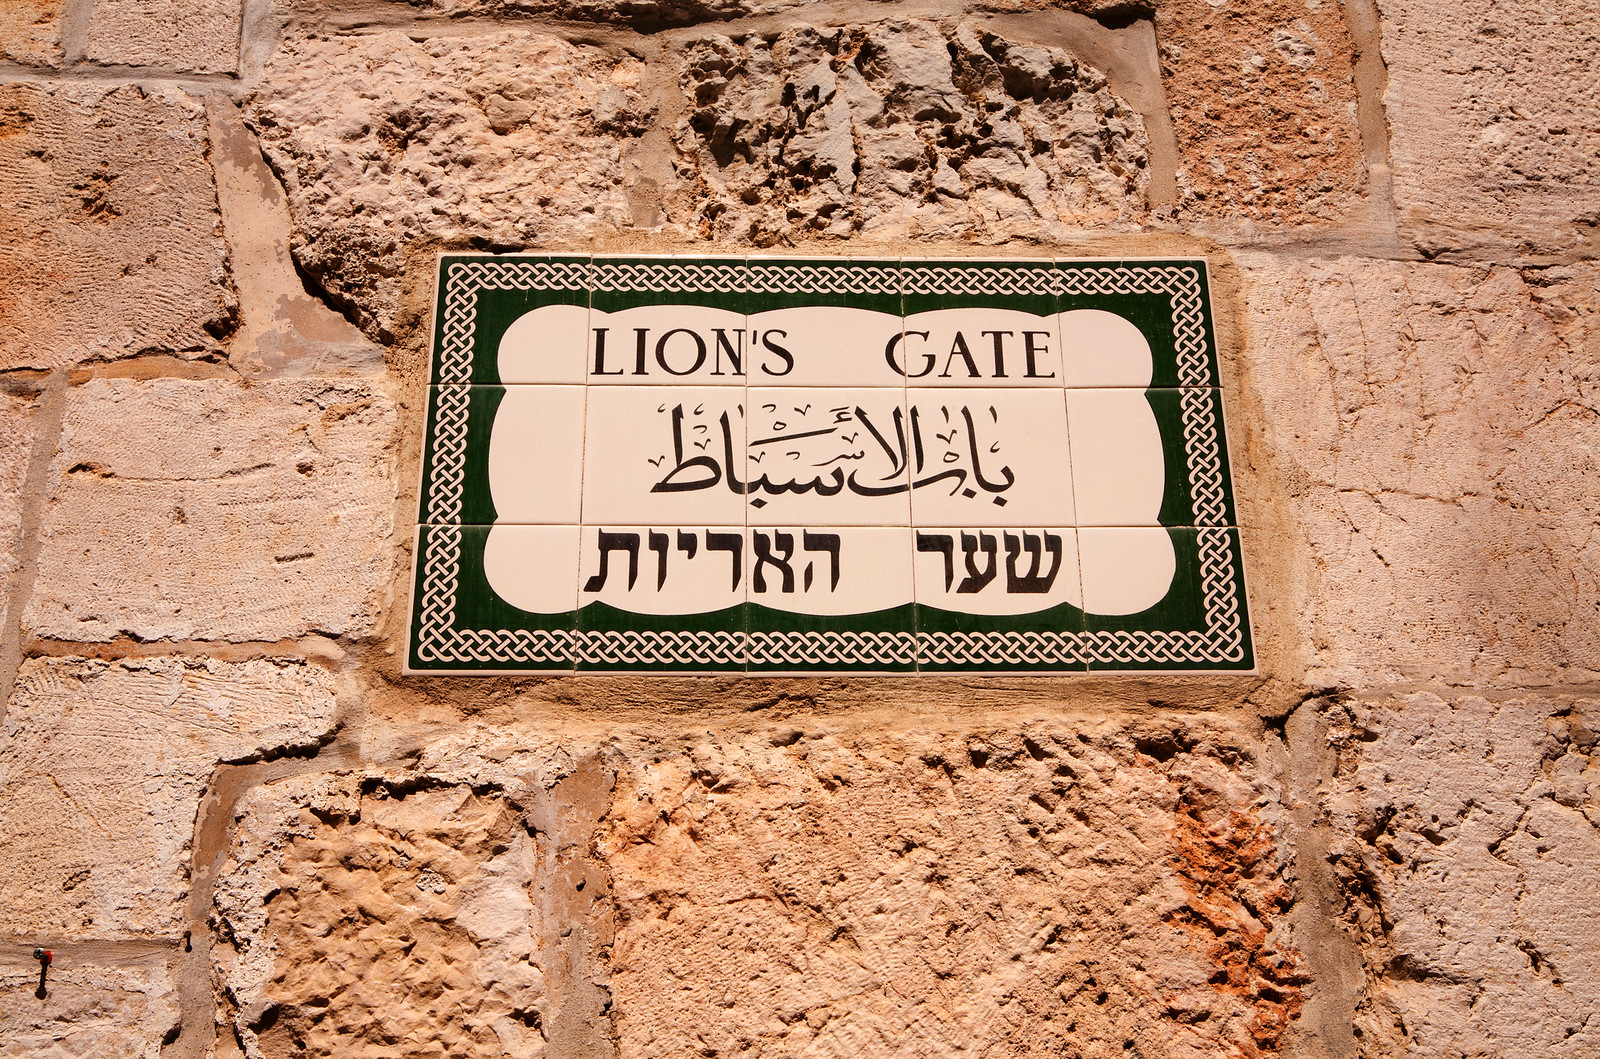 Jerusalem_Old City_Lions' Gate_ Sha'ar HaArayot_2_Noam Chen_